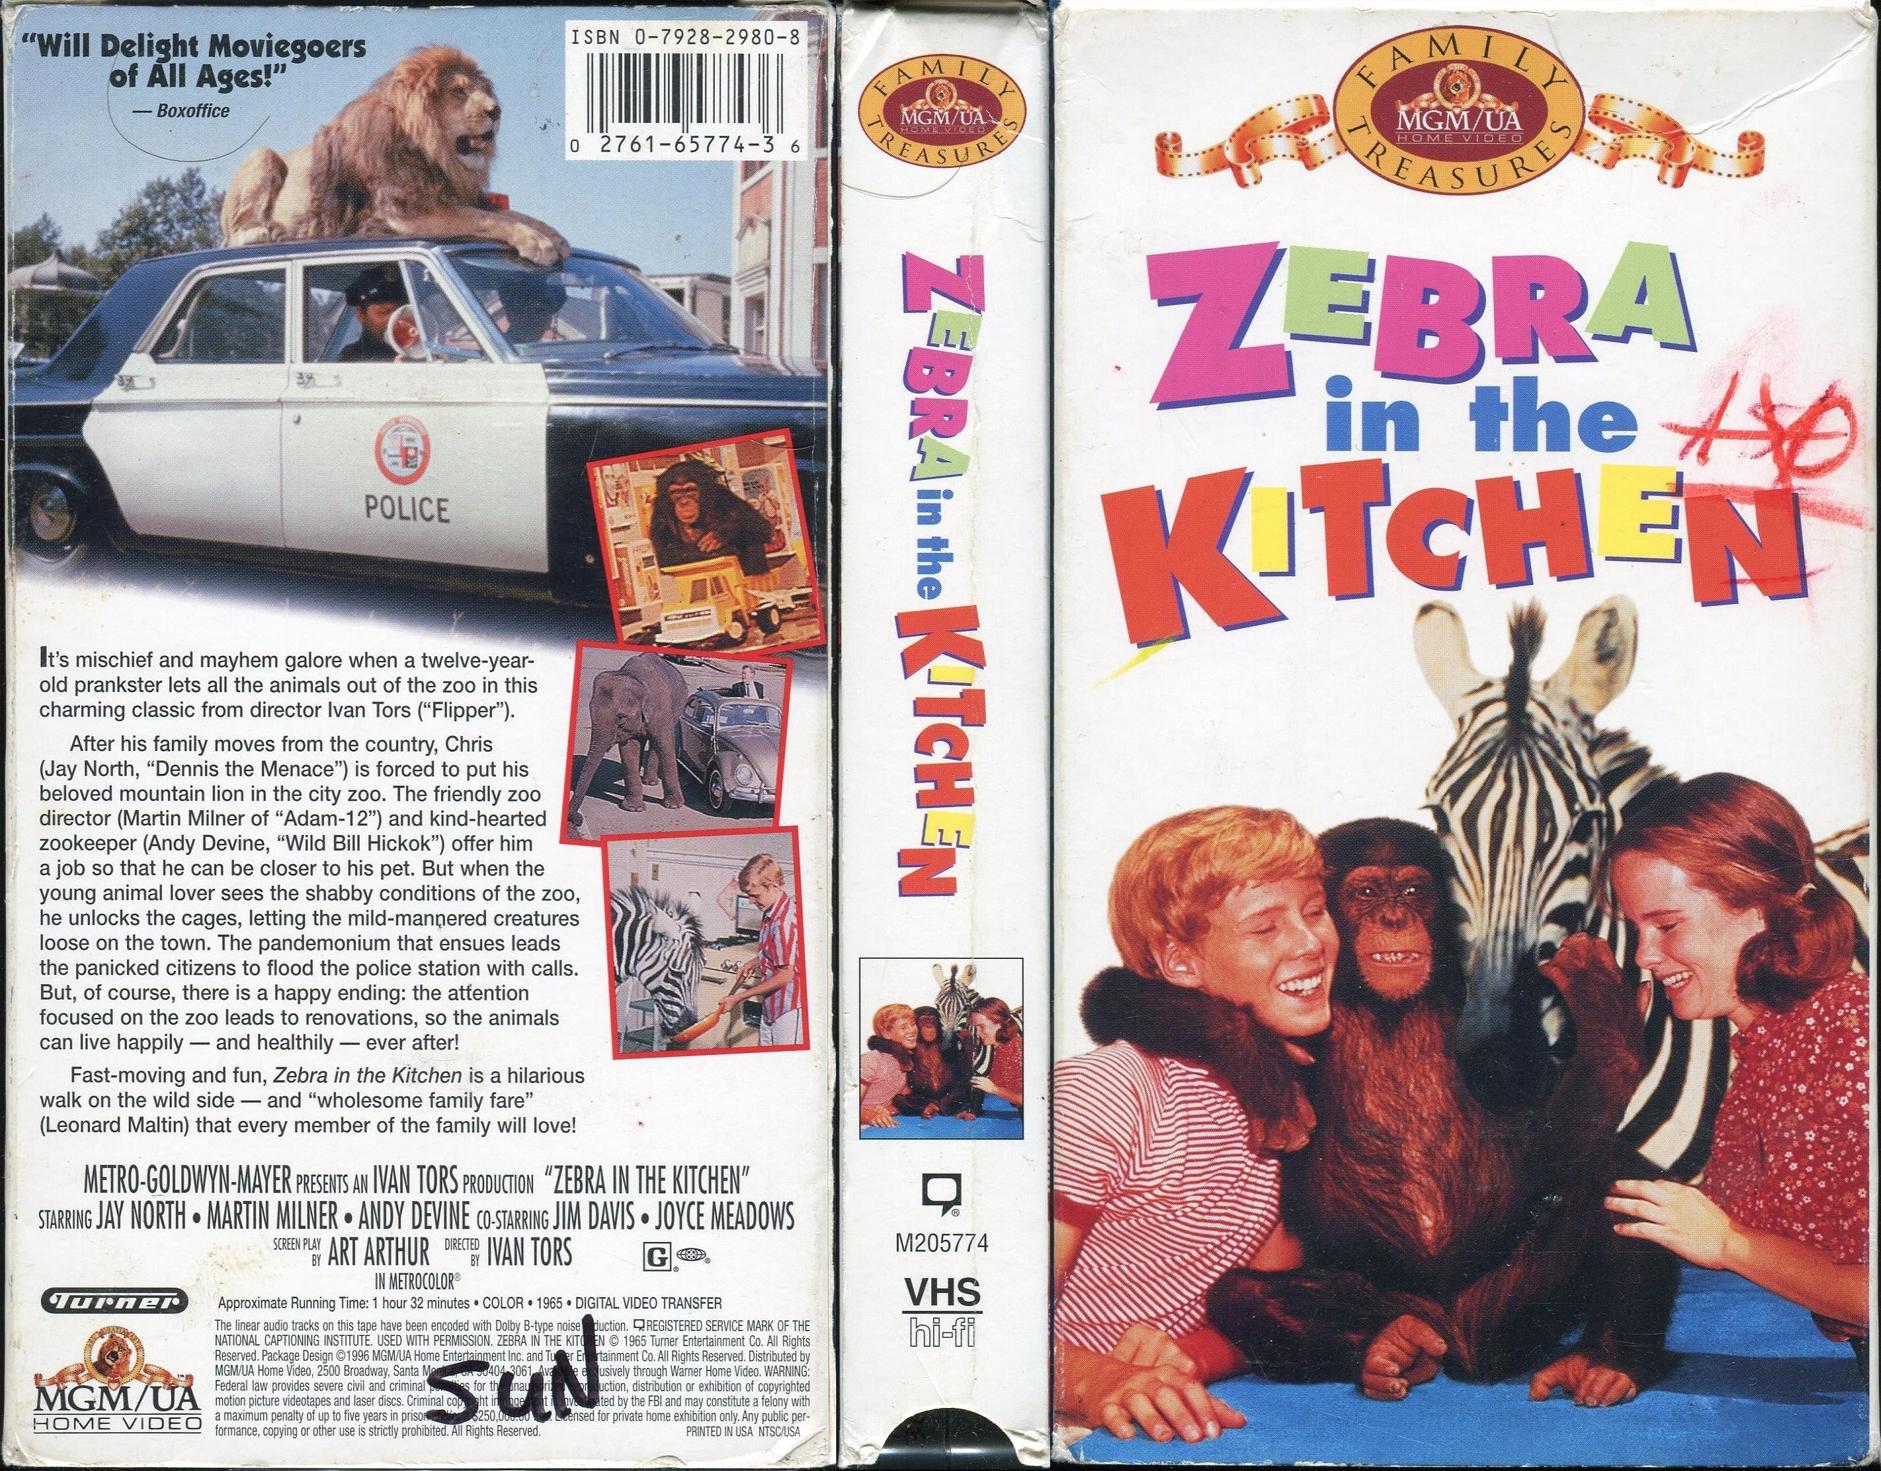 www.debiuey.estranky.sk - Zebra in the Kitchen Movie Dvd